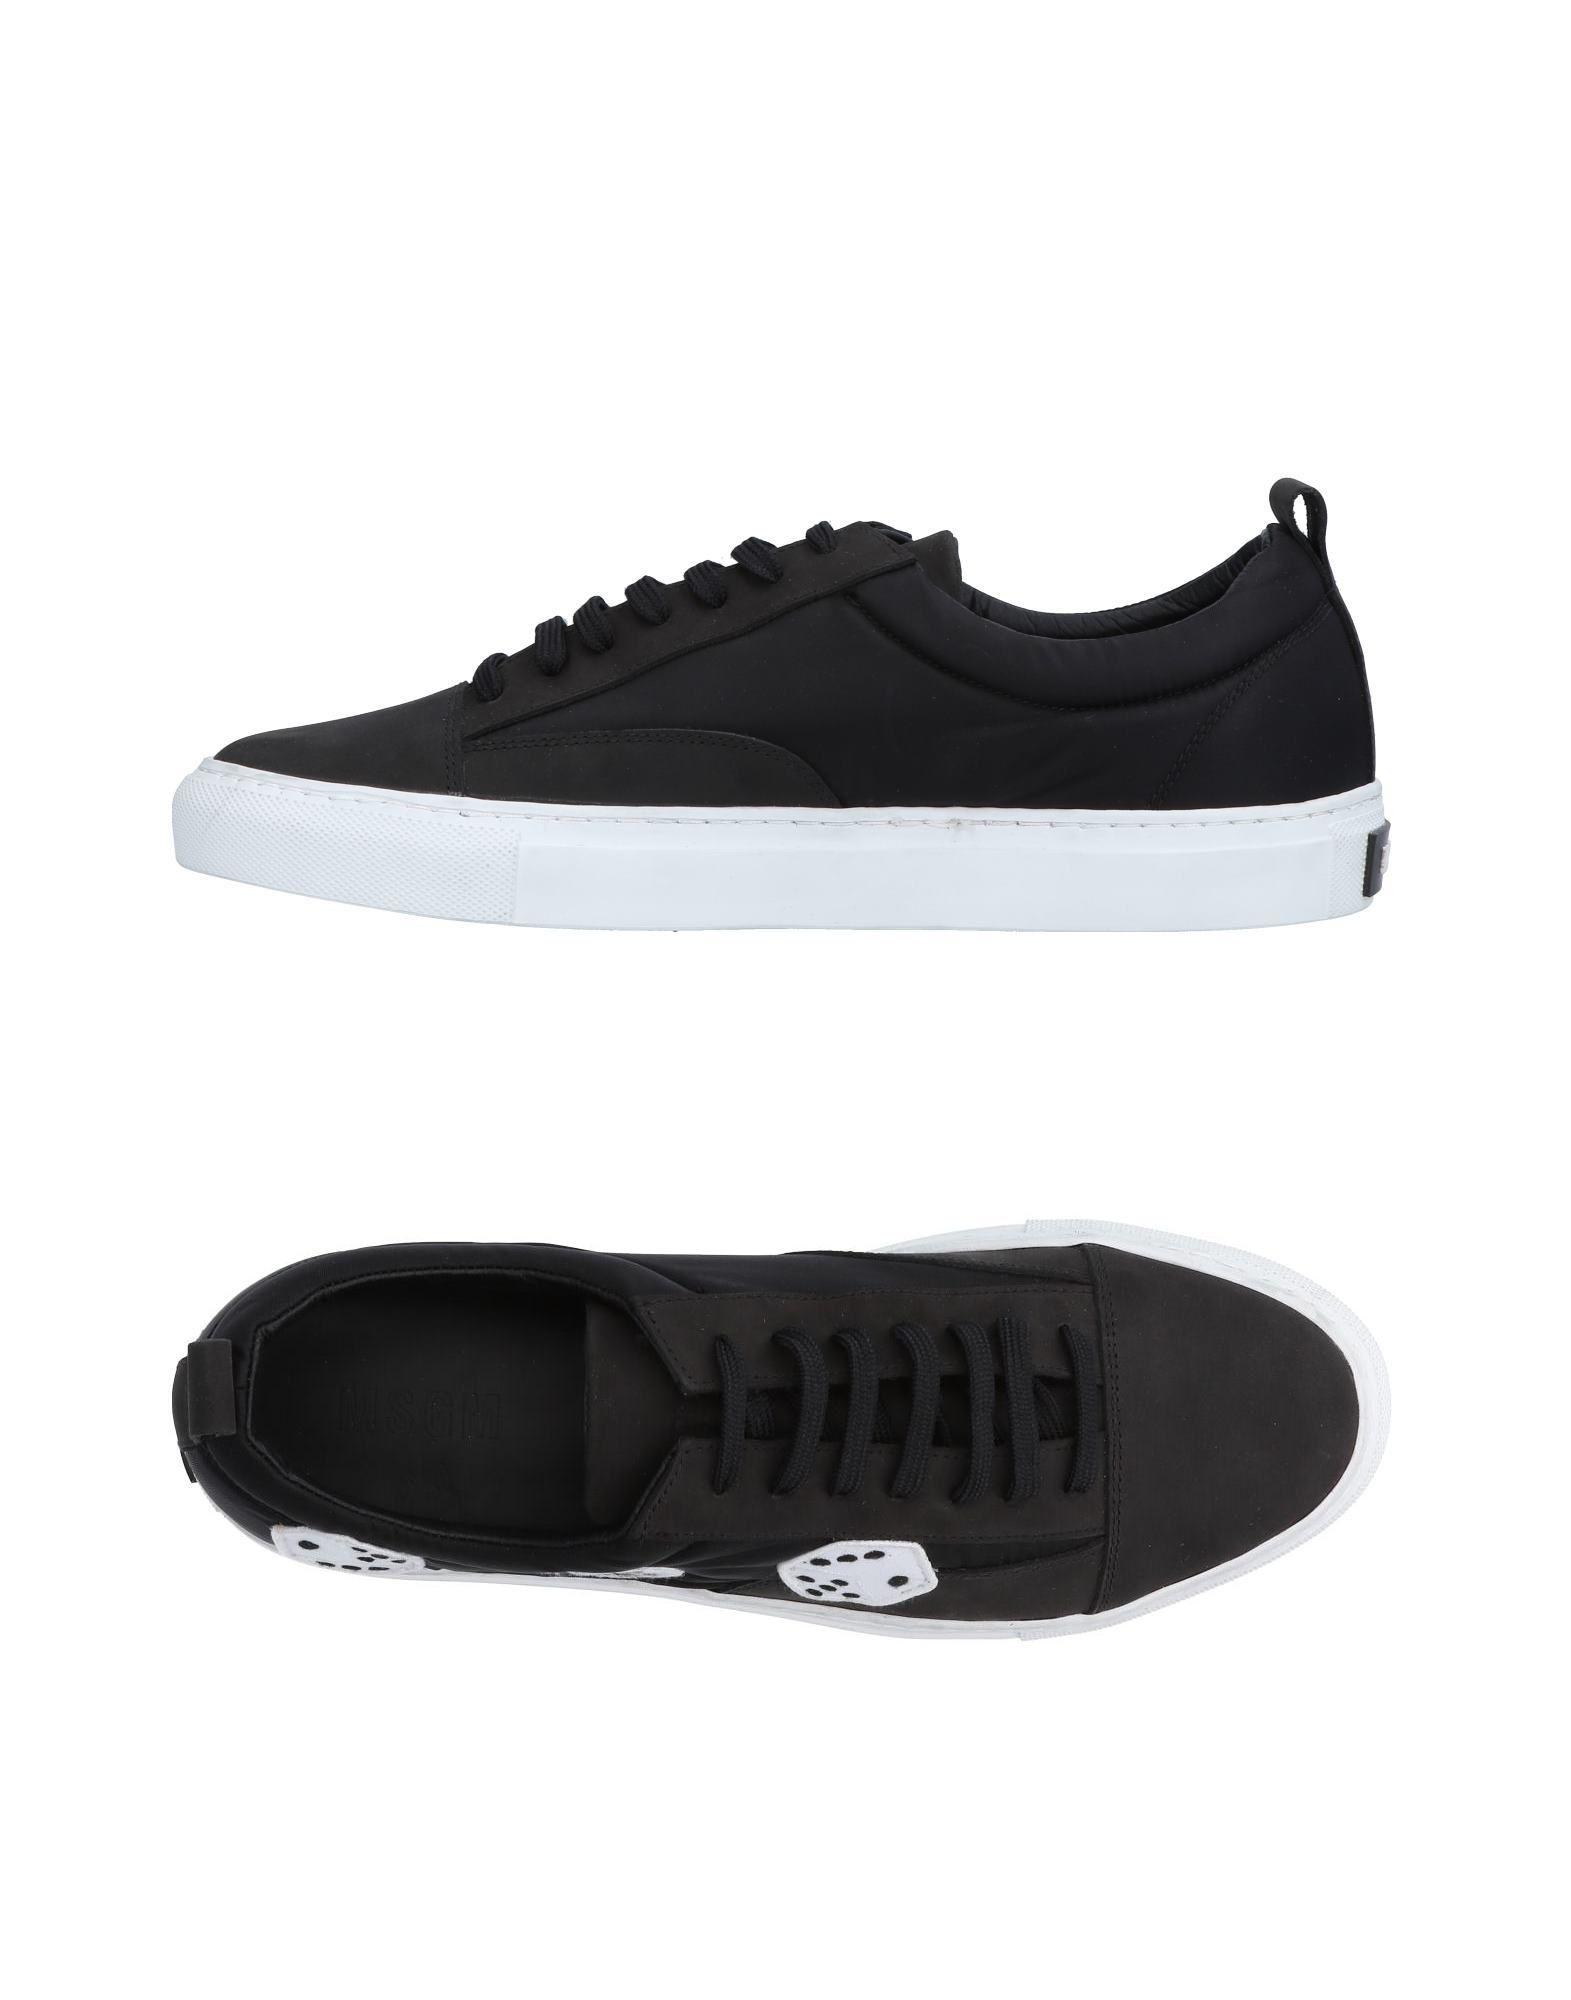 Rabatt echte Schuhe Msgm Sneakers Herren  11493975FI